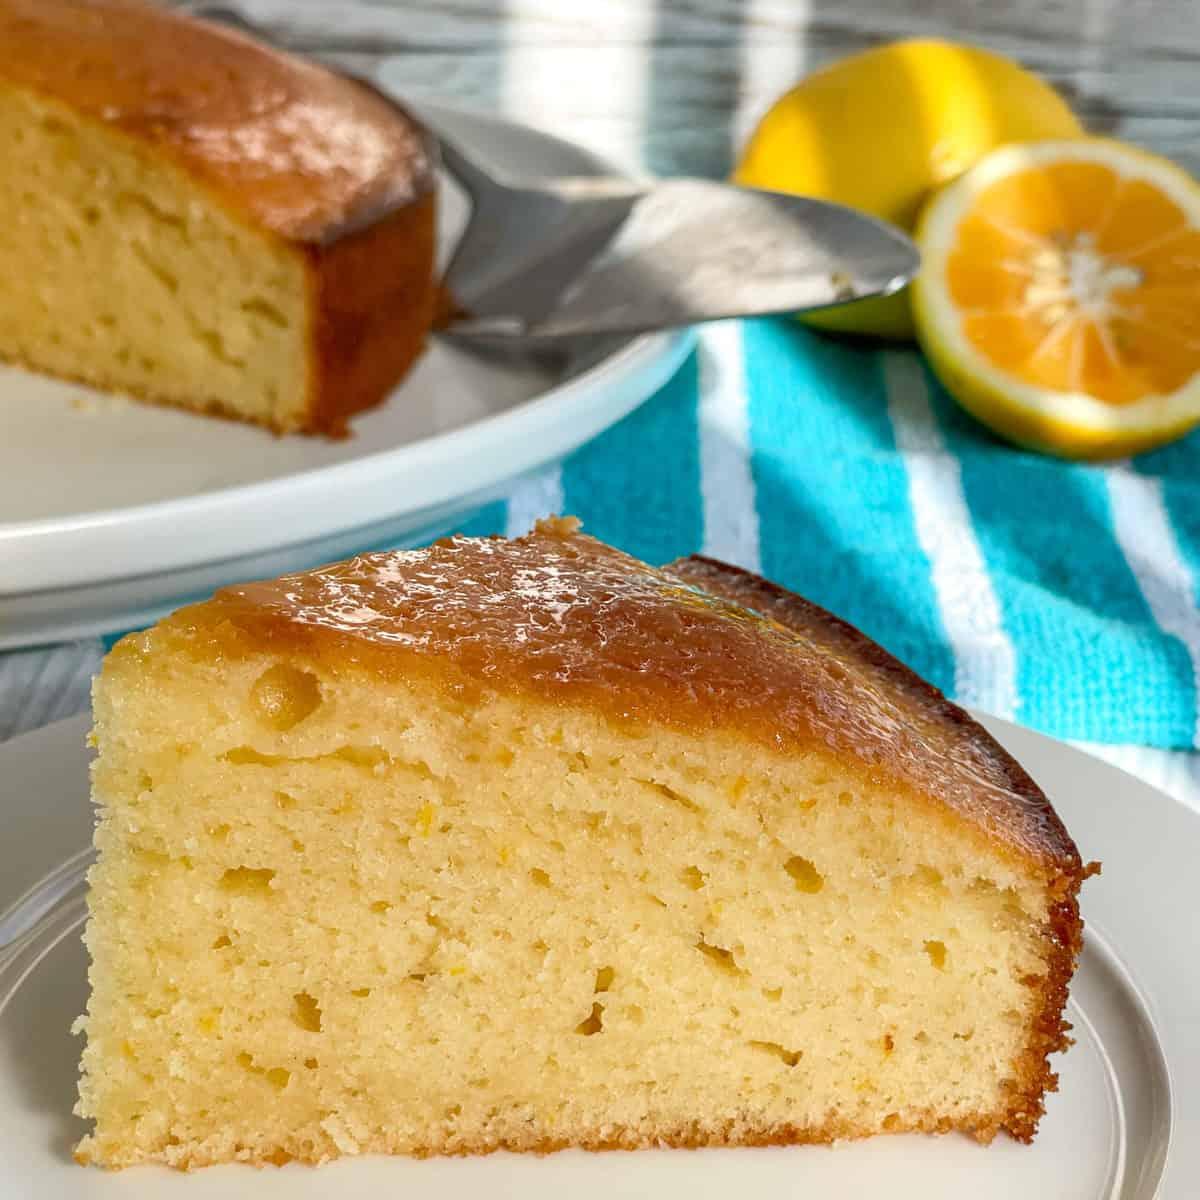 Piece of lemon syrup cake